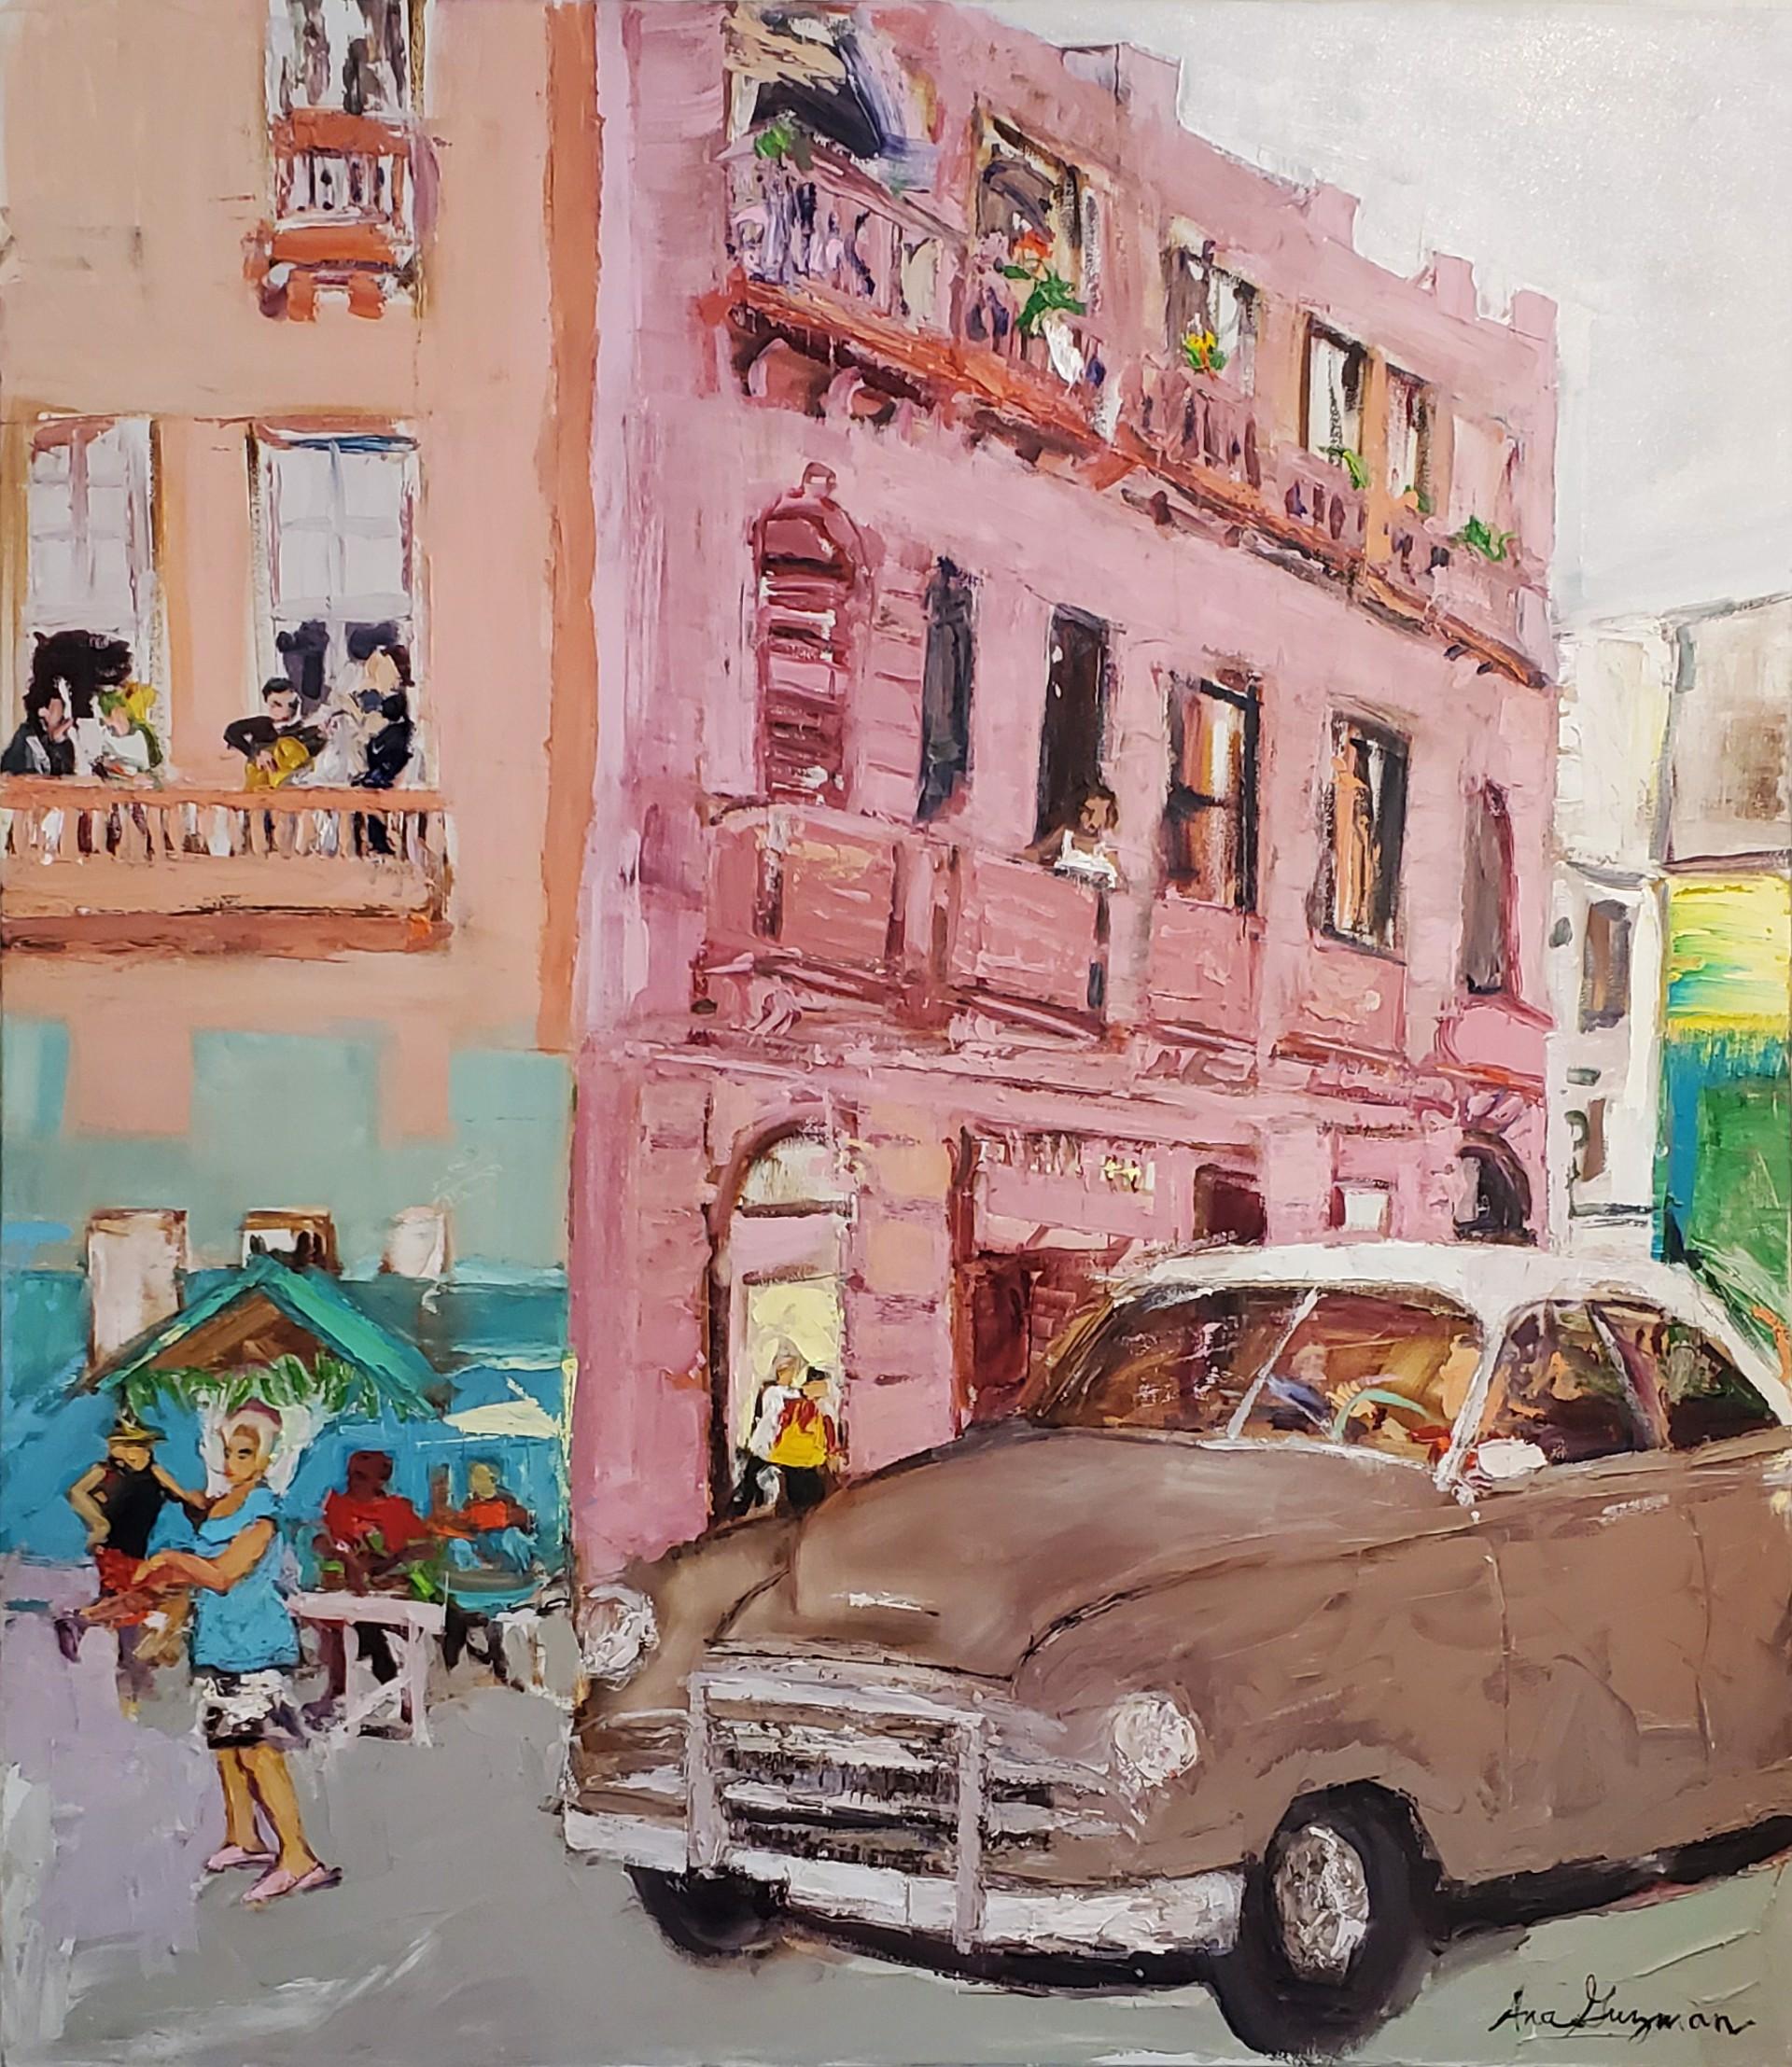 La Vida Cuba - Calle La Rosada by Ana Guzman